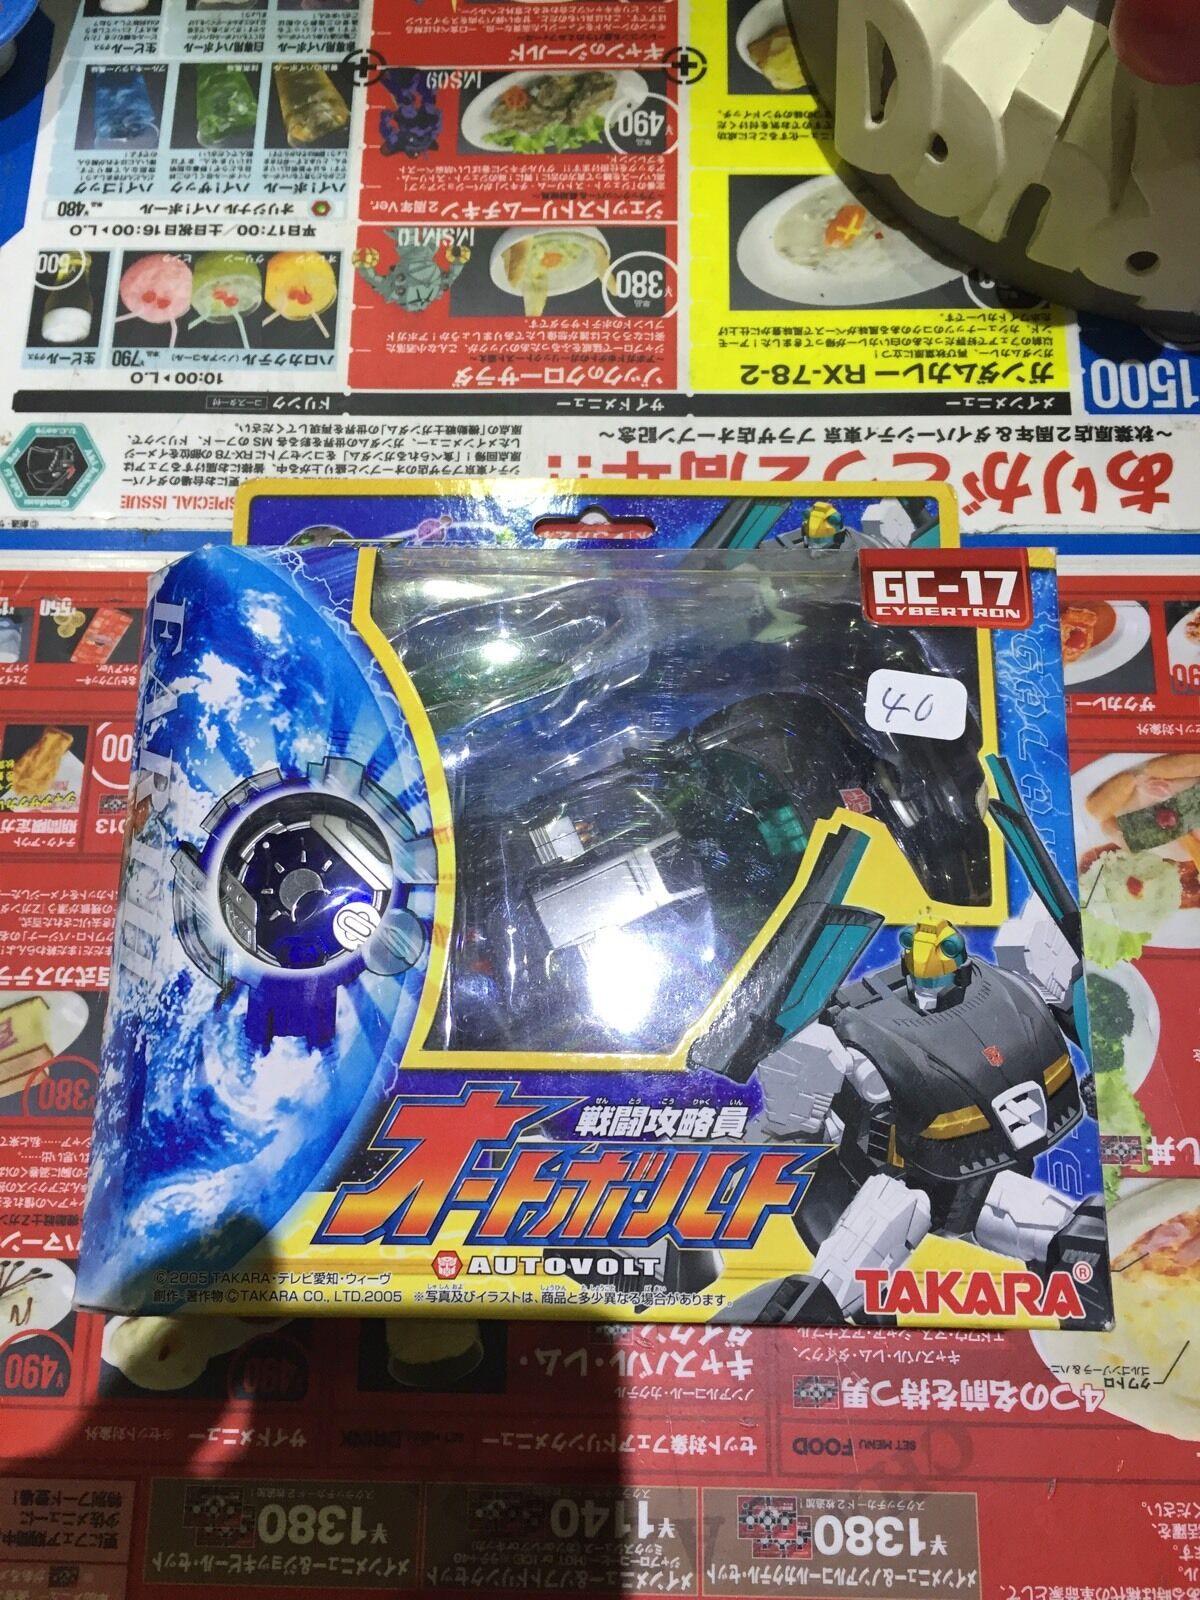 1 Boite Transformers Takara 2005 Autovolt Gc-17 Cybertron Galaxy Force